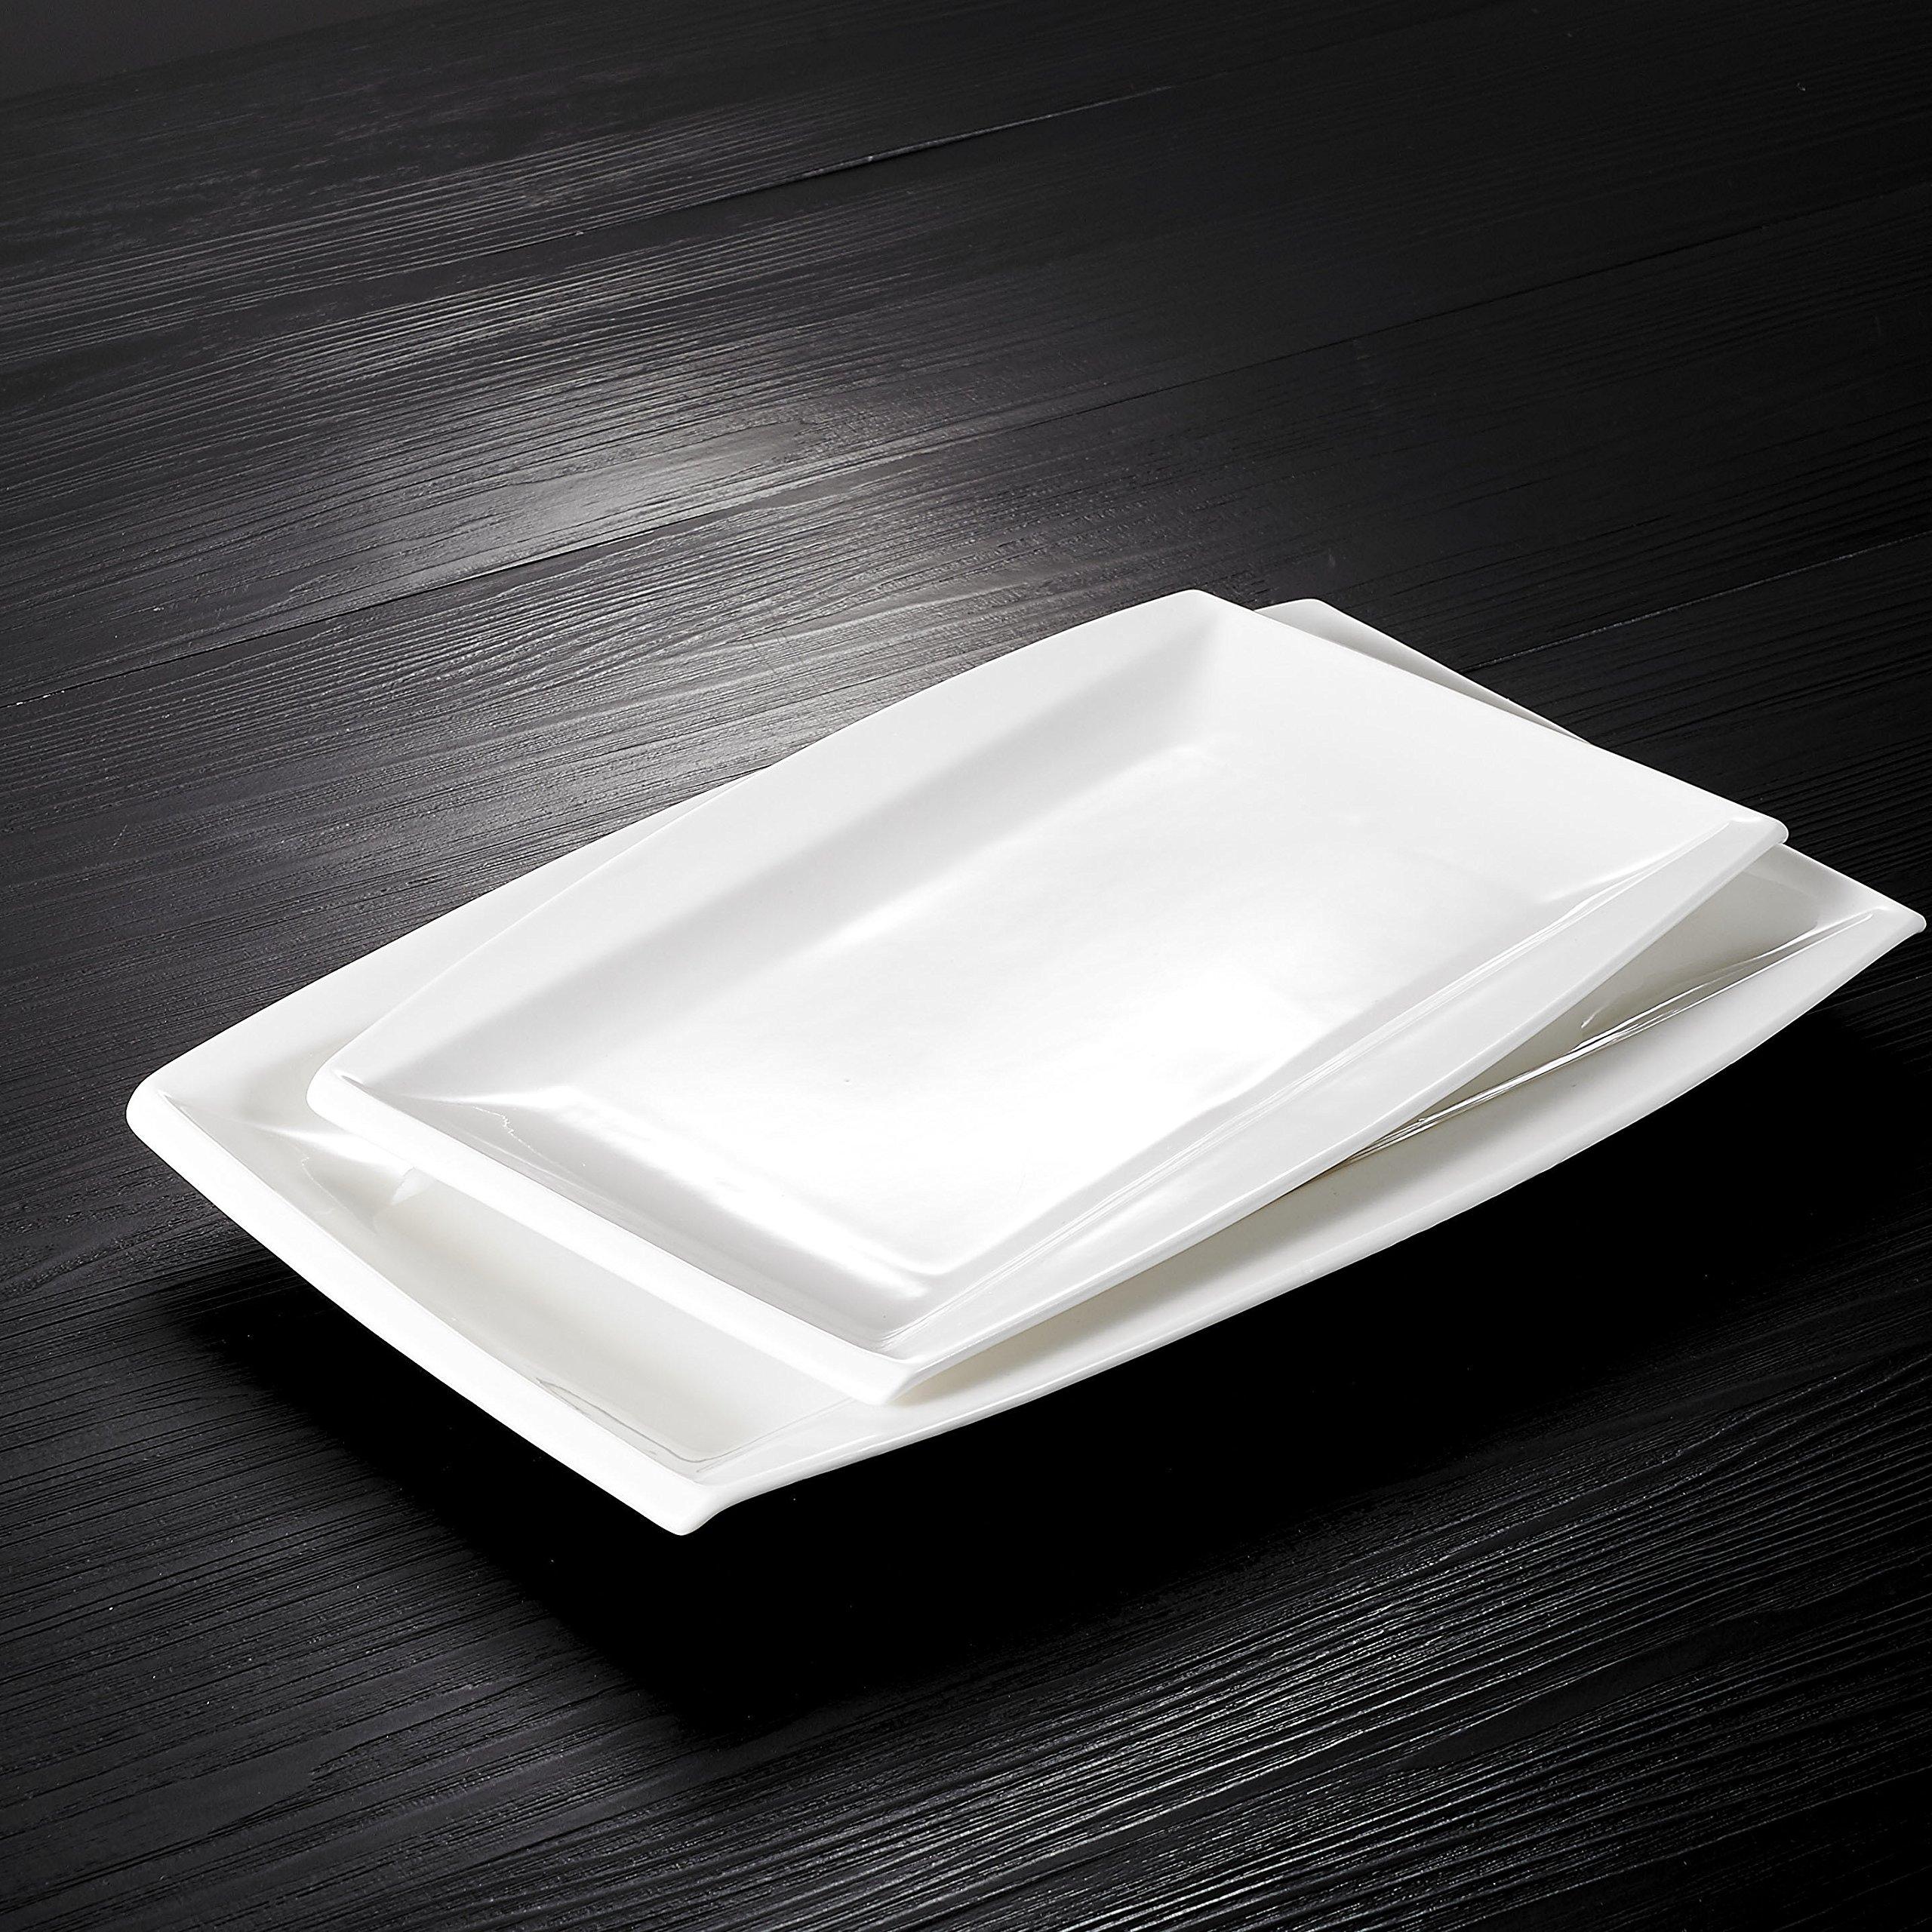 Malacasa, Series Blance, 2-Piece Ivory White Porcelain Dinnerware Set, 11'' & 13.25'' Rectangular Plates Serving Platters